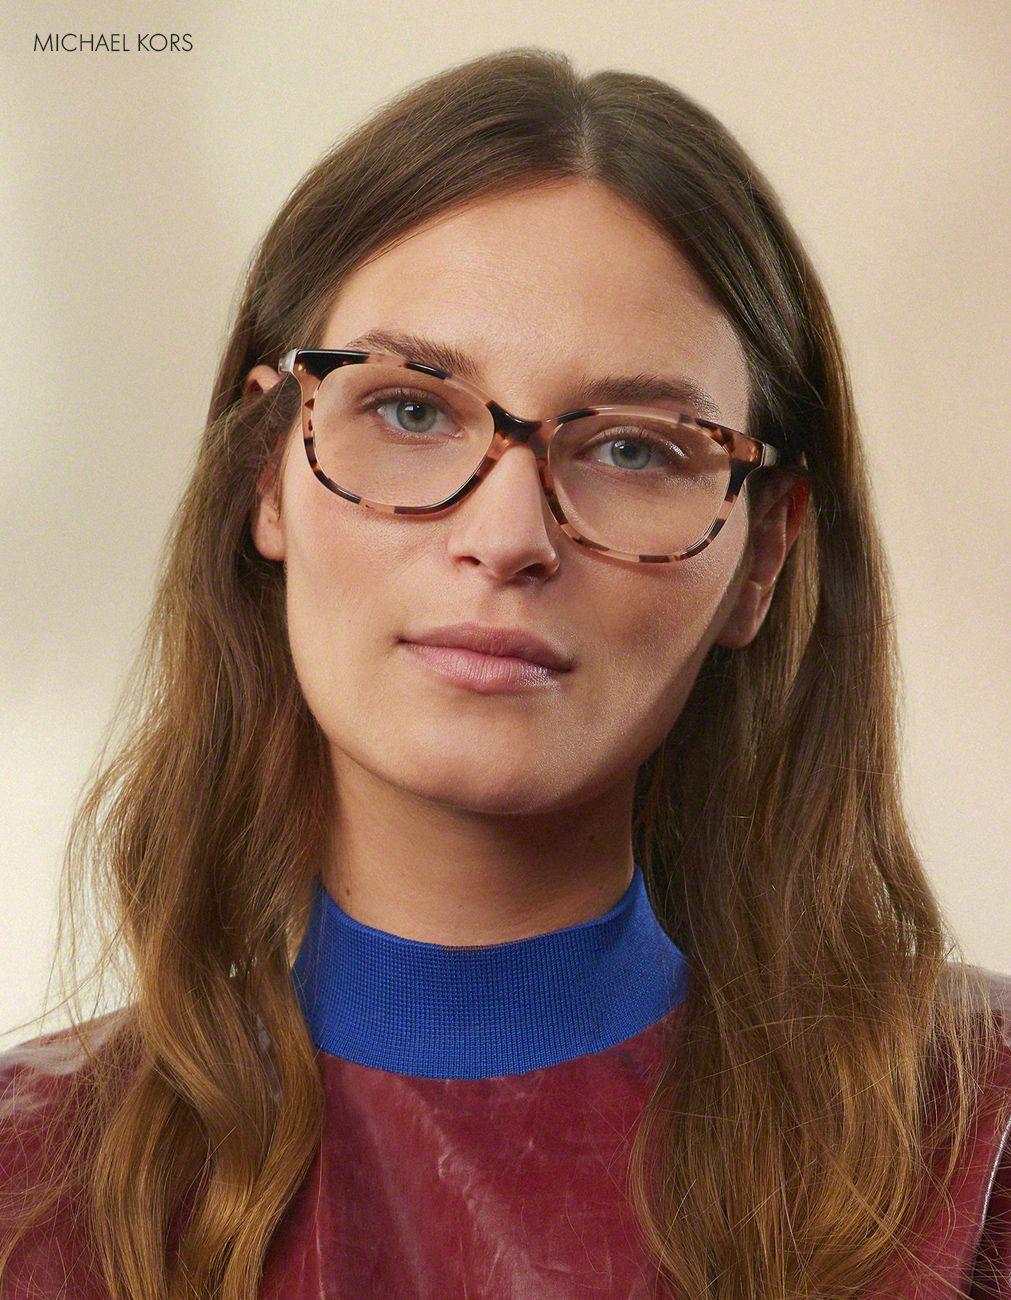 Women wearing Vogue glasses